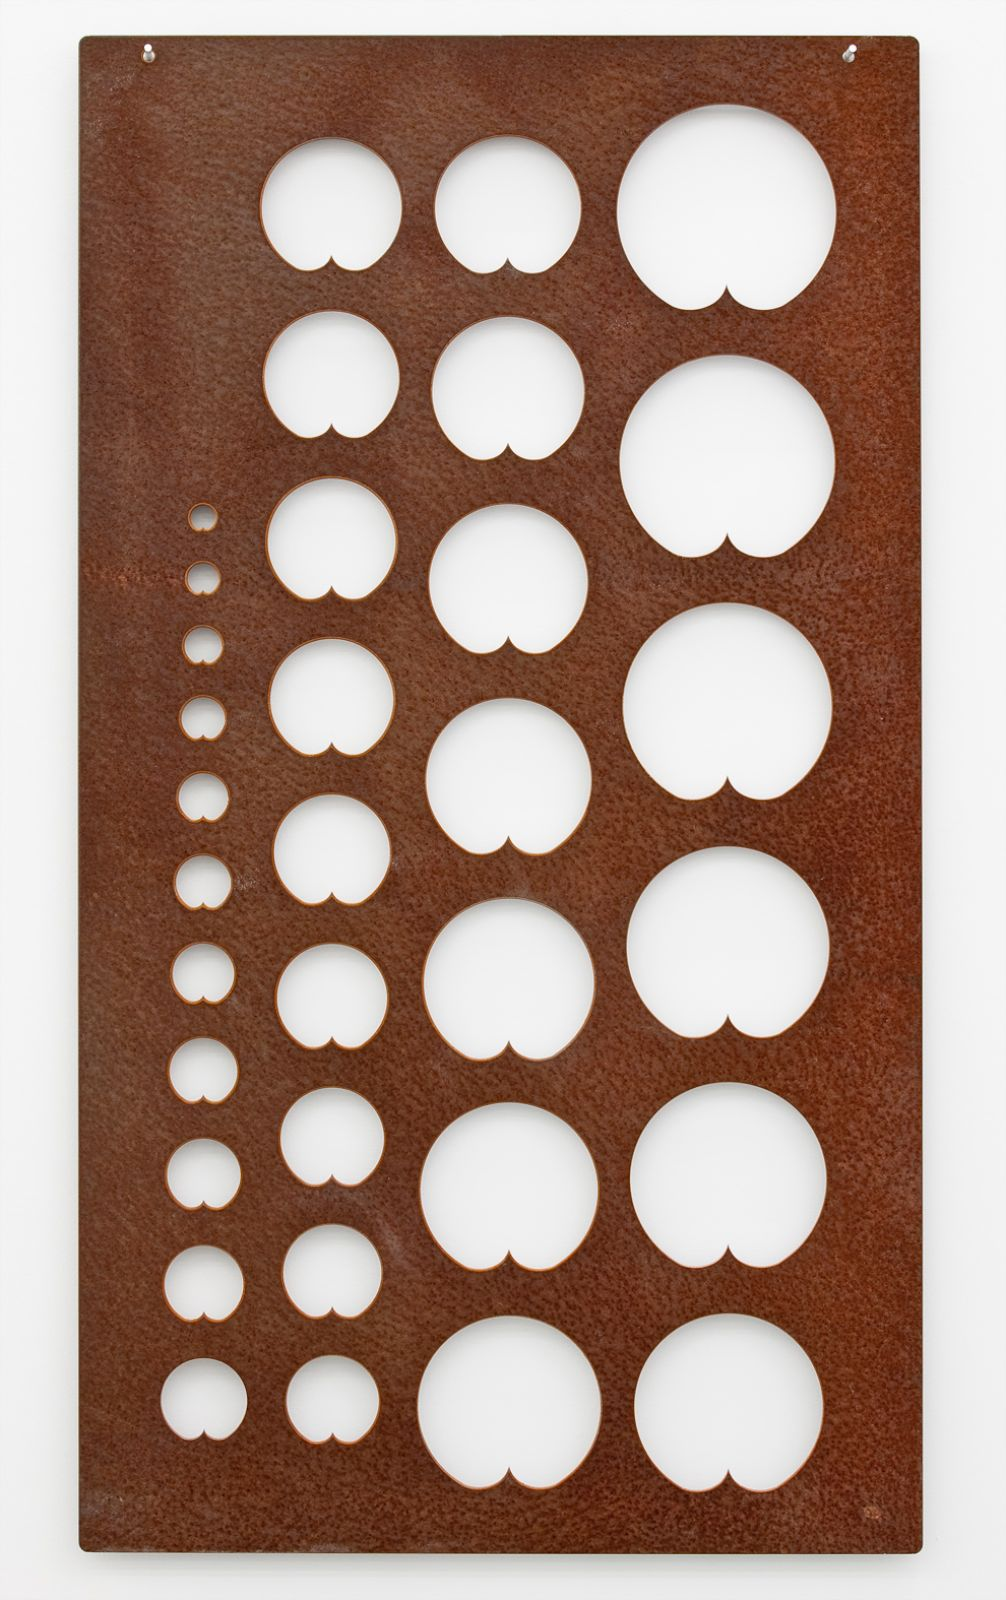 Scratch, 2010, steel, 109 x 60 x 0,3 cm